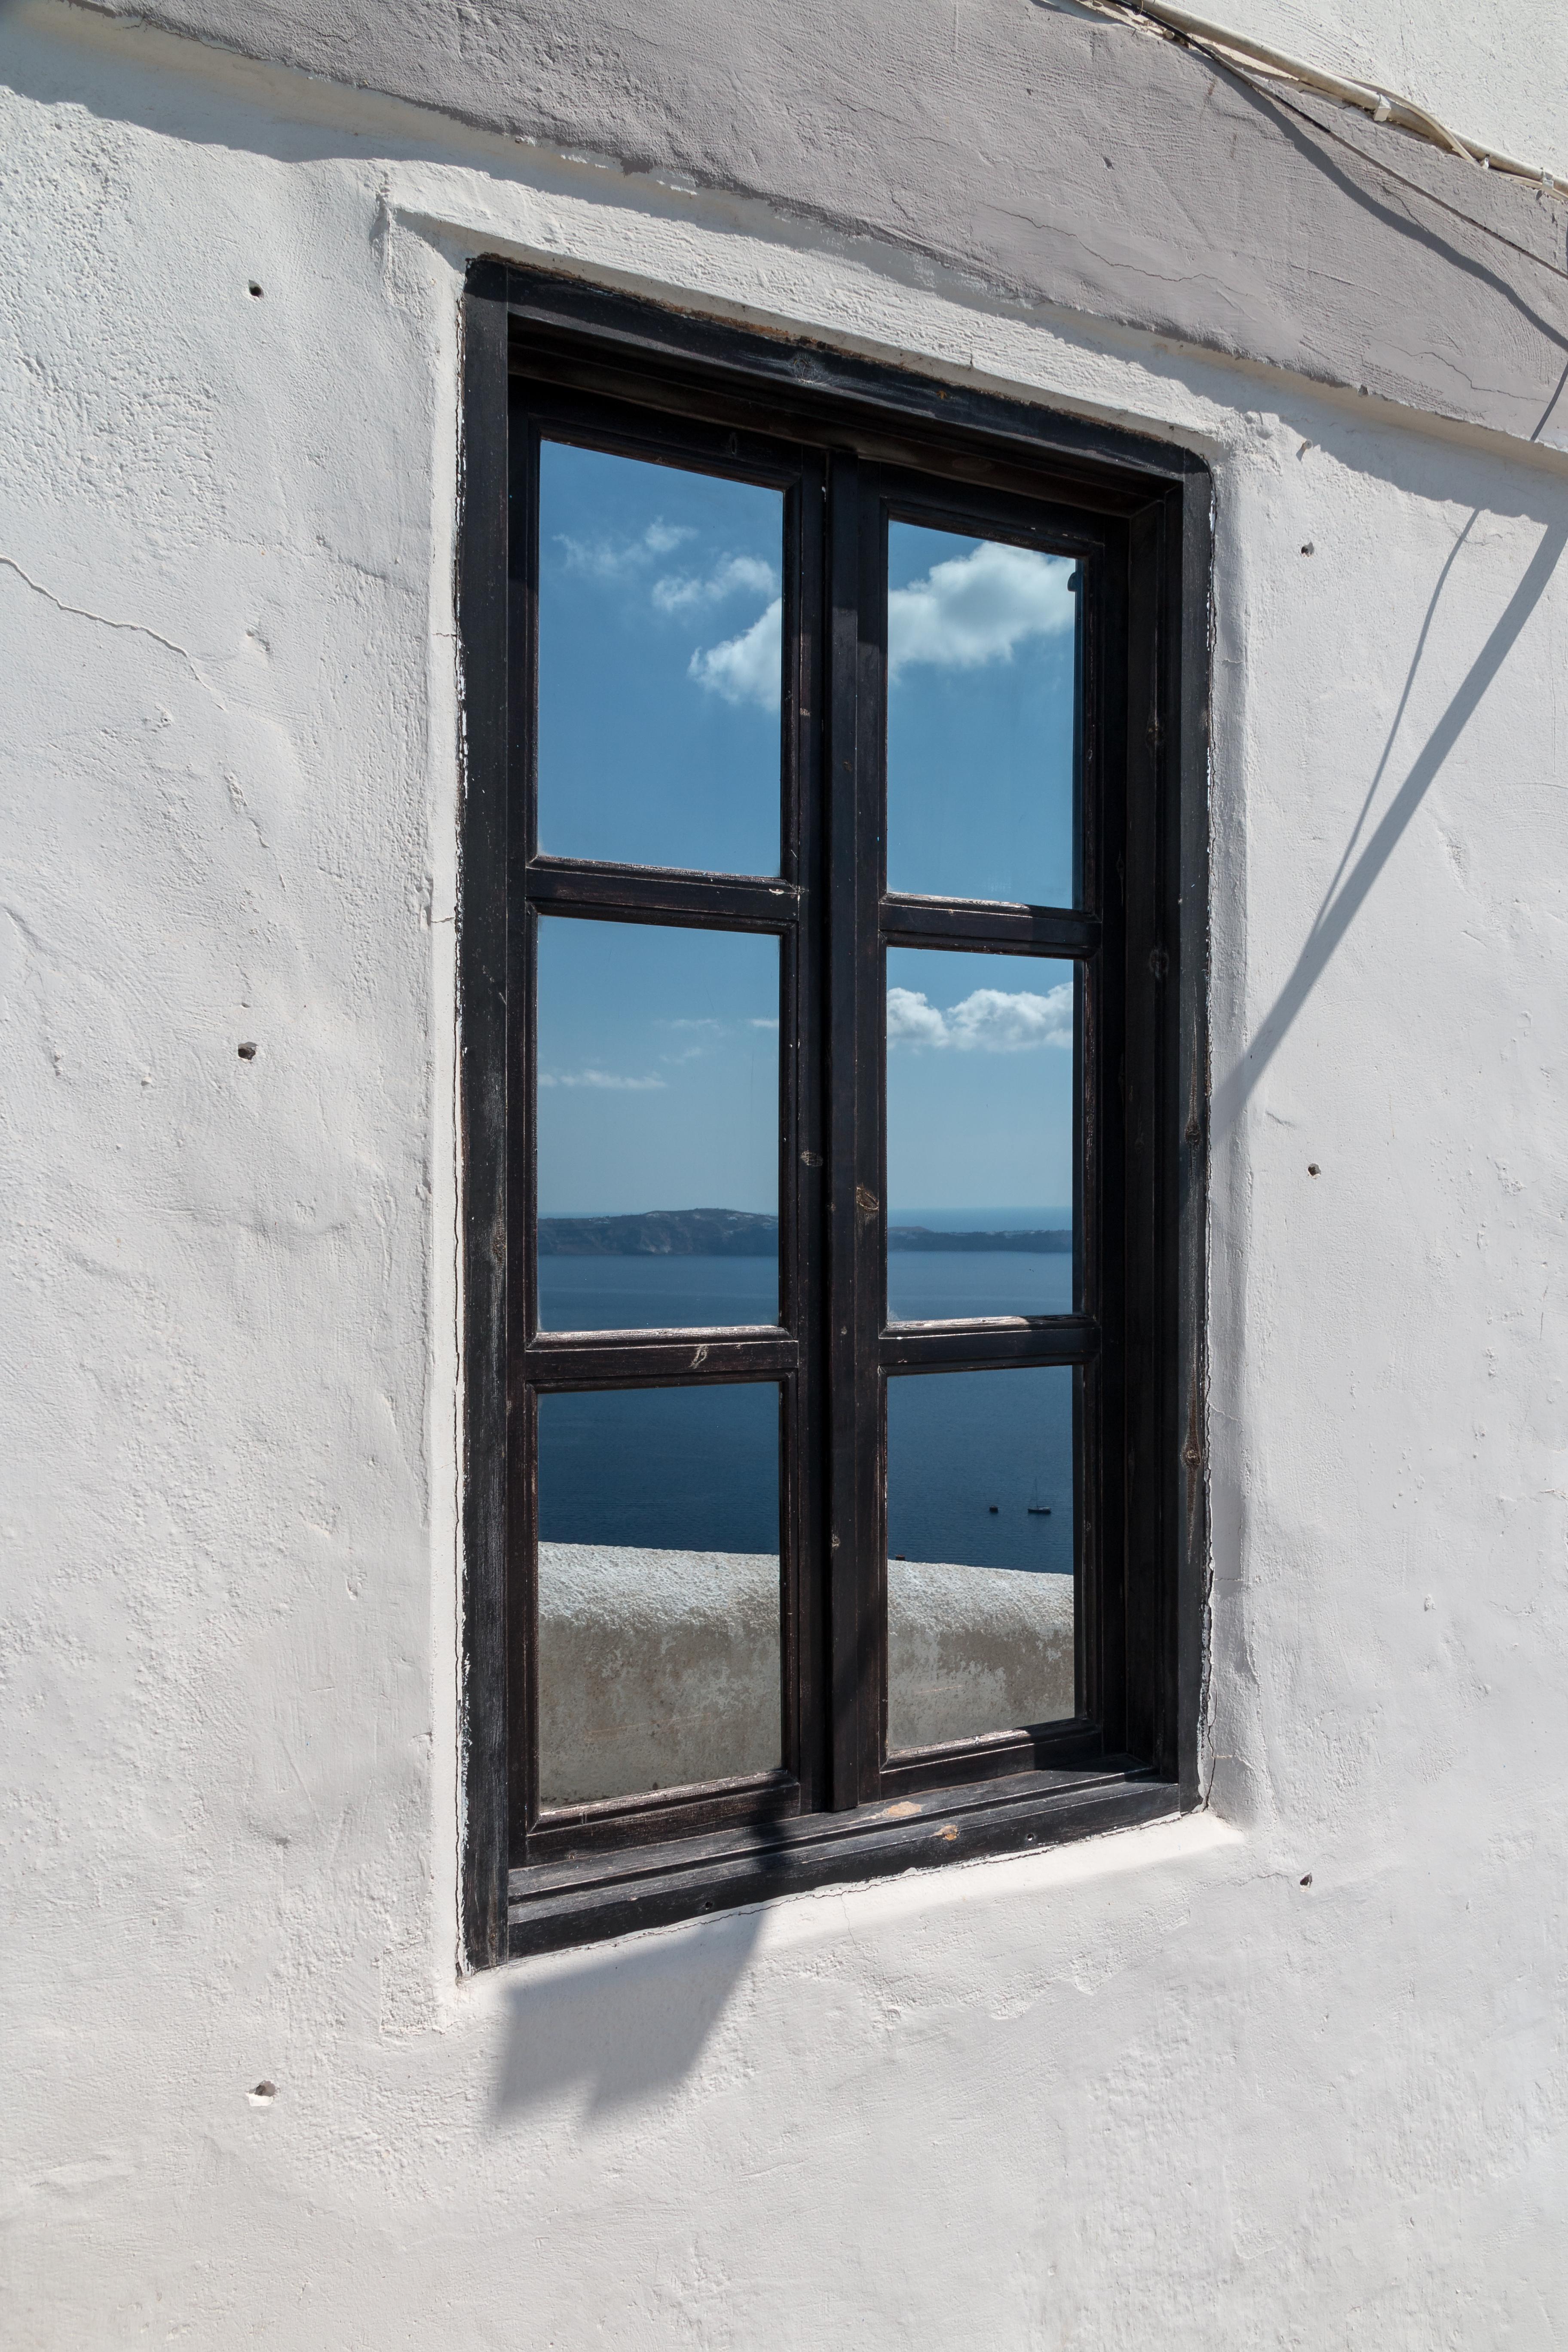 Porta Finestra Ingresso Casa finestra - wikipedia